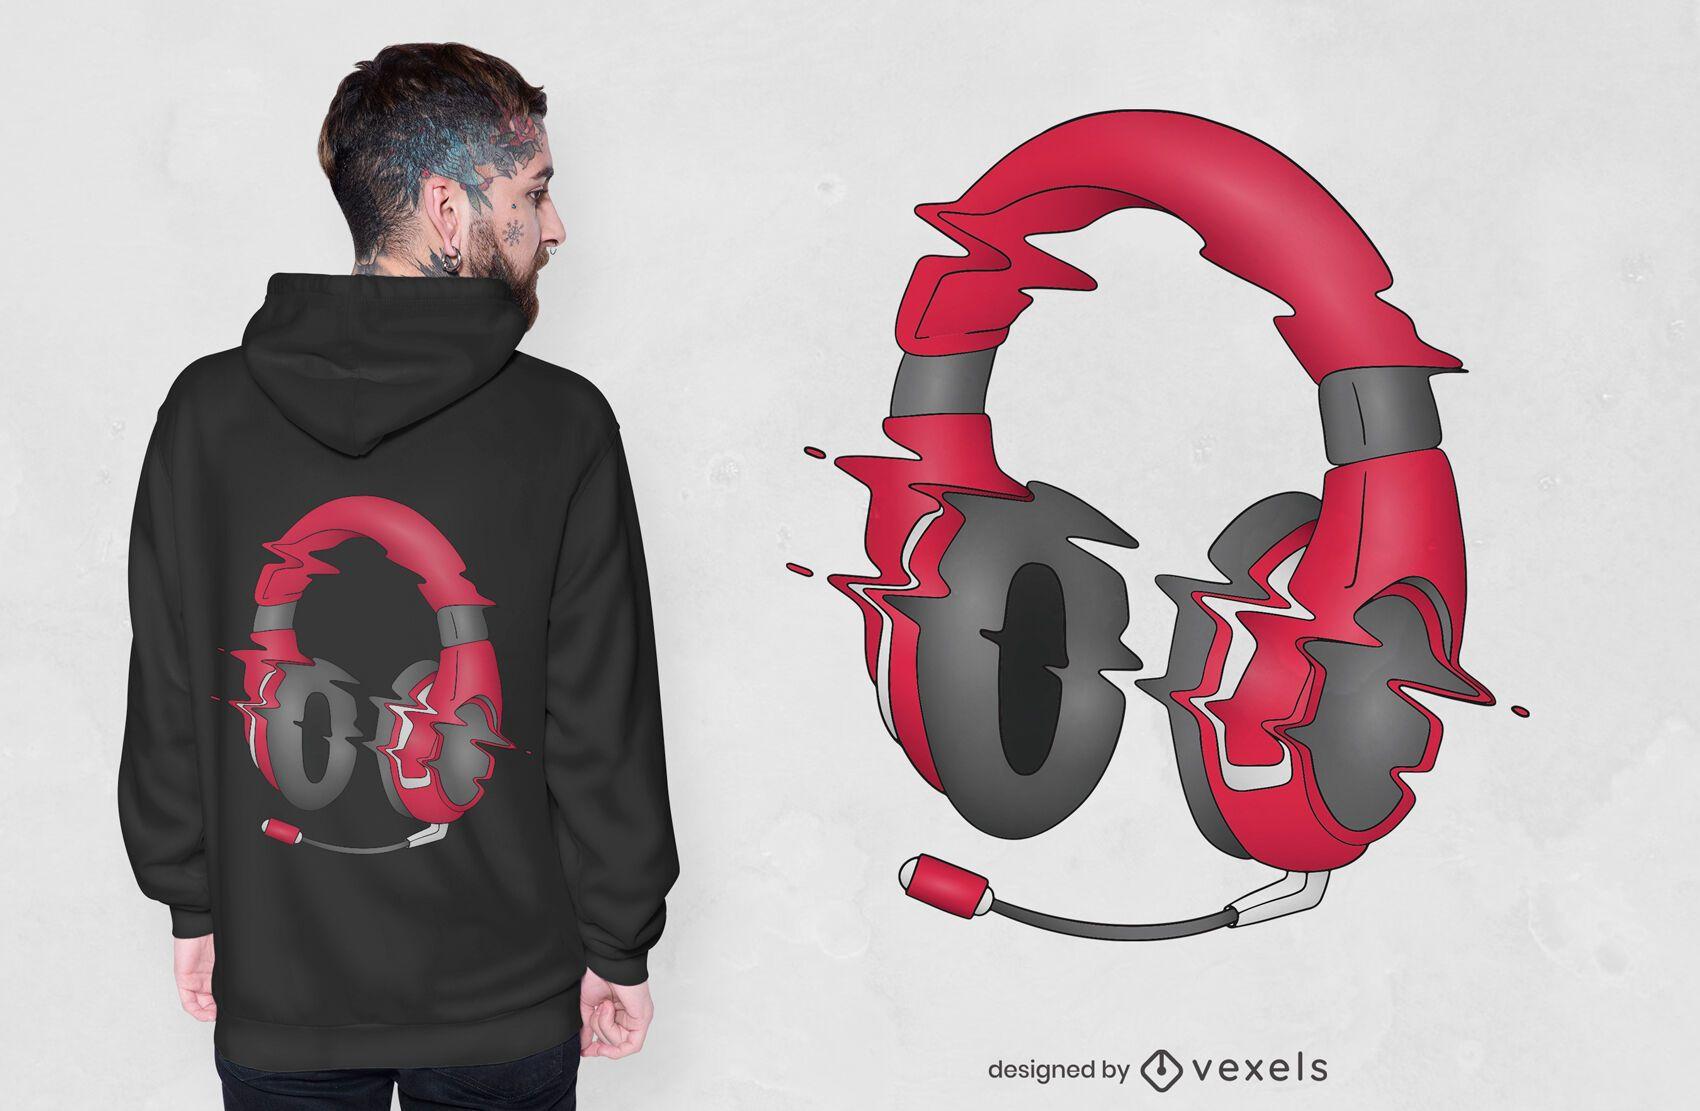 Glitchy headphones t-shirt design